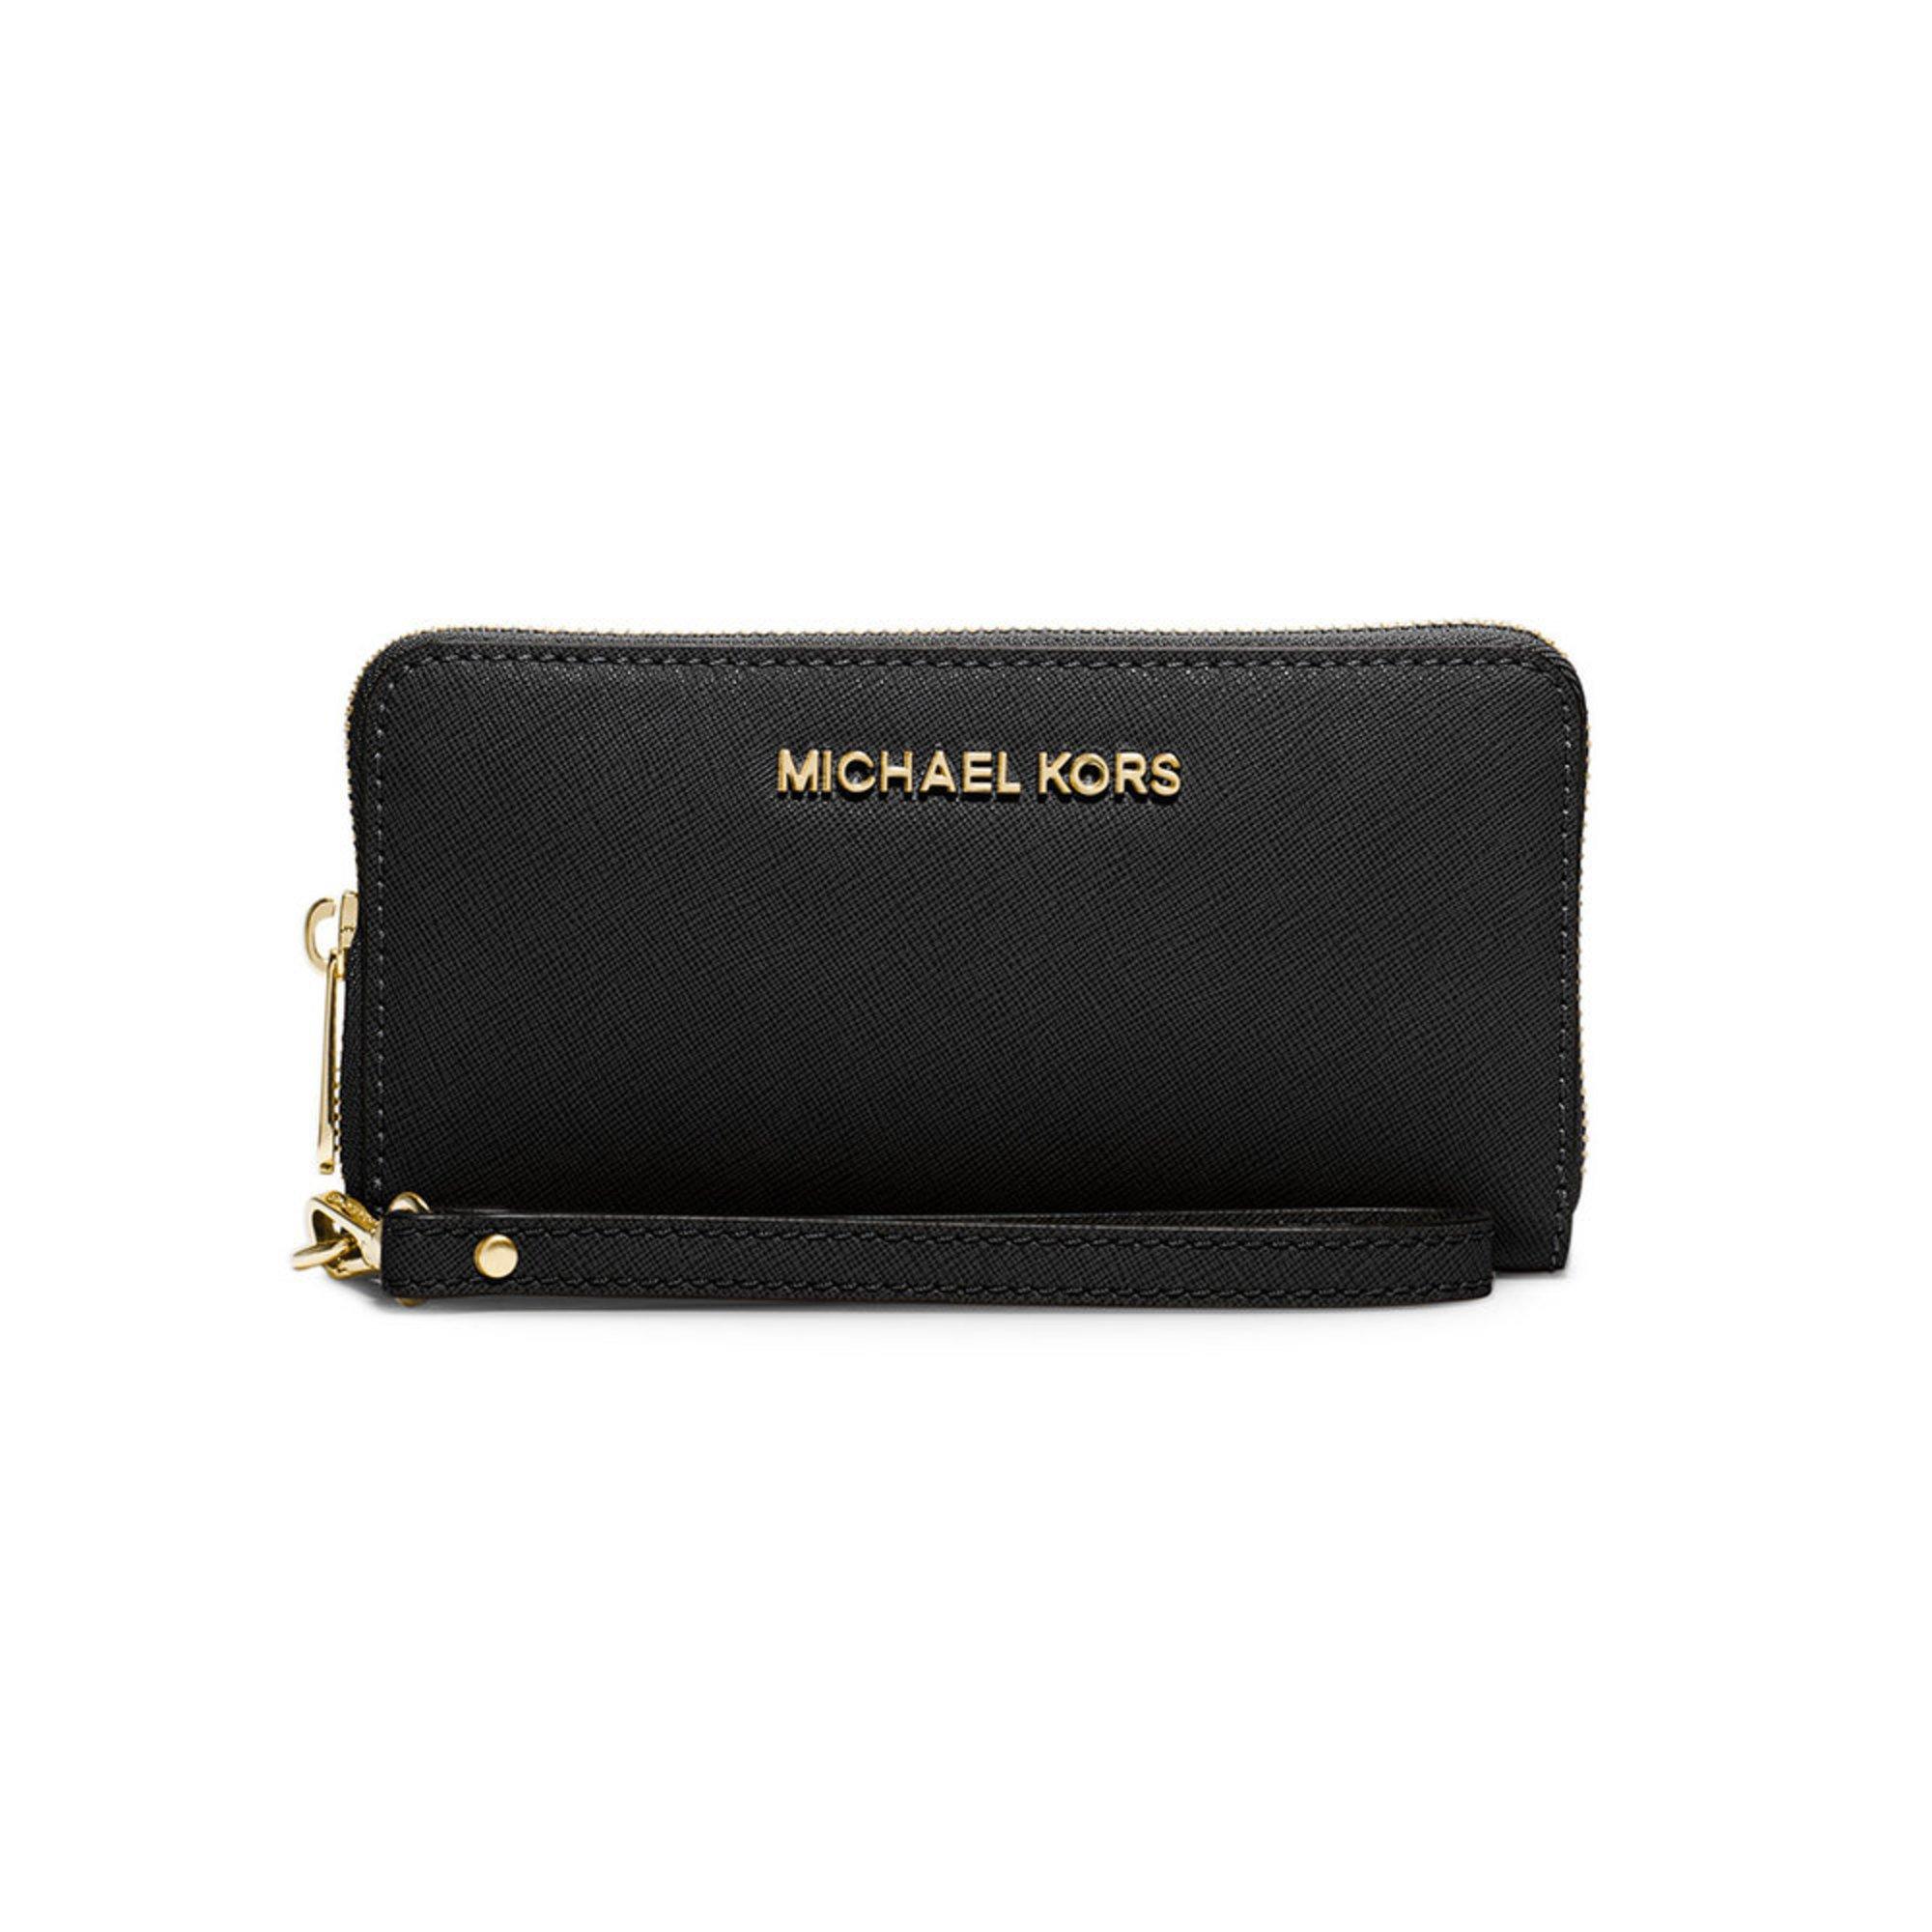 3bd7b4033ee1bf Michael Kors Jet Set Travel Large Flat Multifunction Phone Case Saffiano  Black | Wristlets | Handbags & Sunglasses - Shop Your Navy Exchange -  Official Site